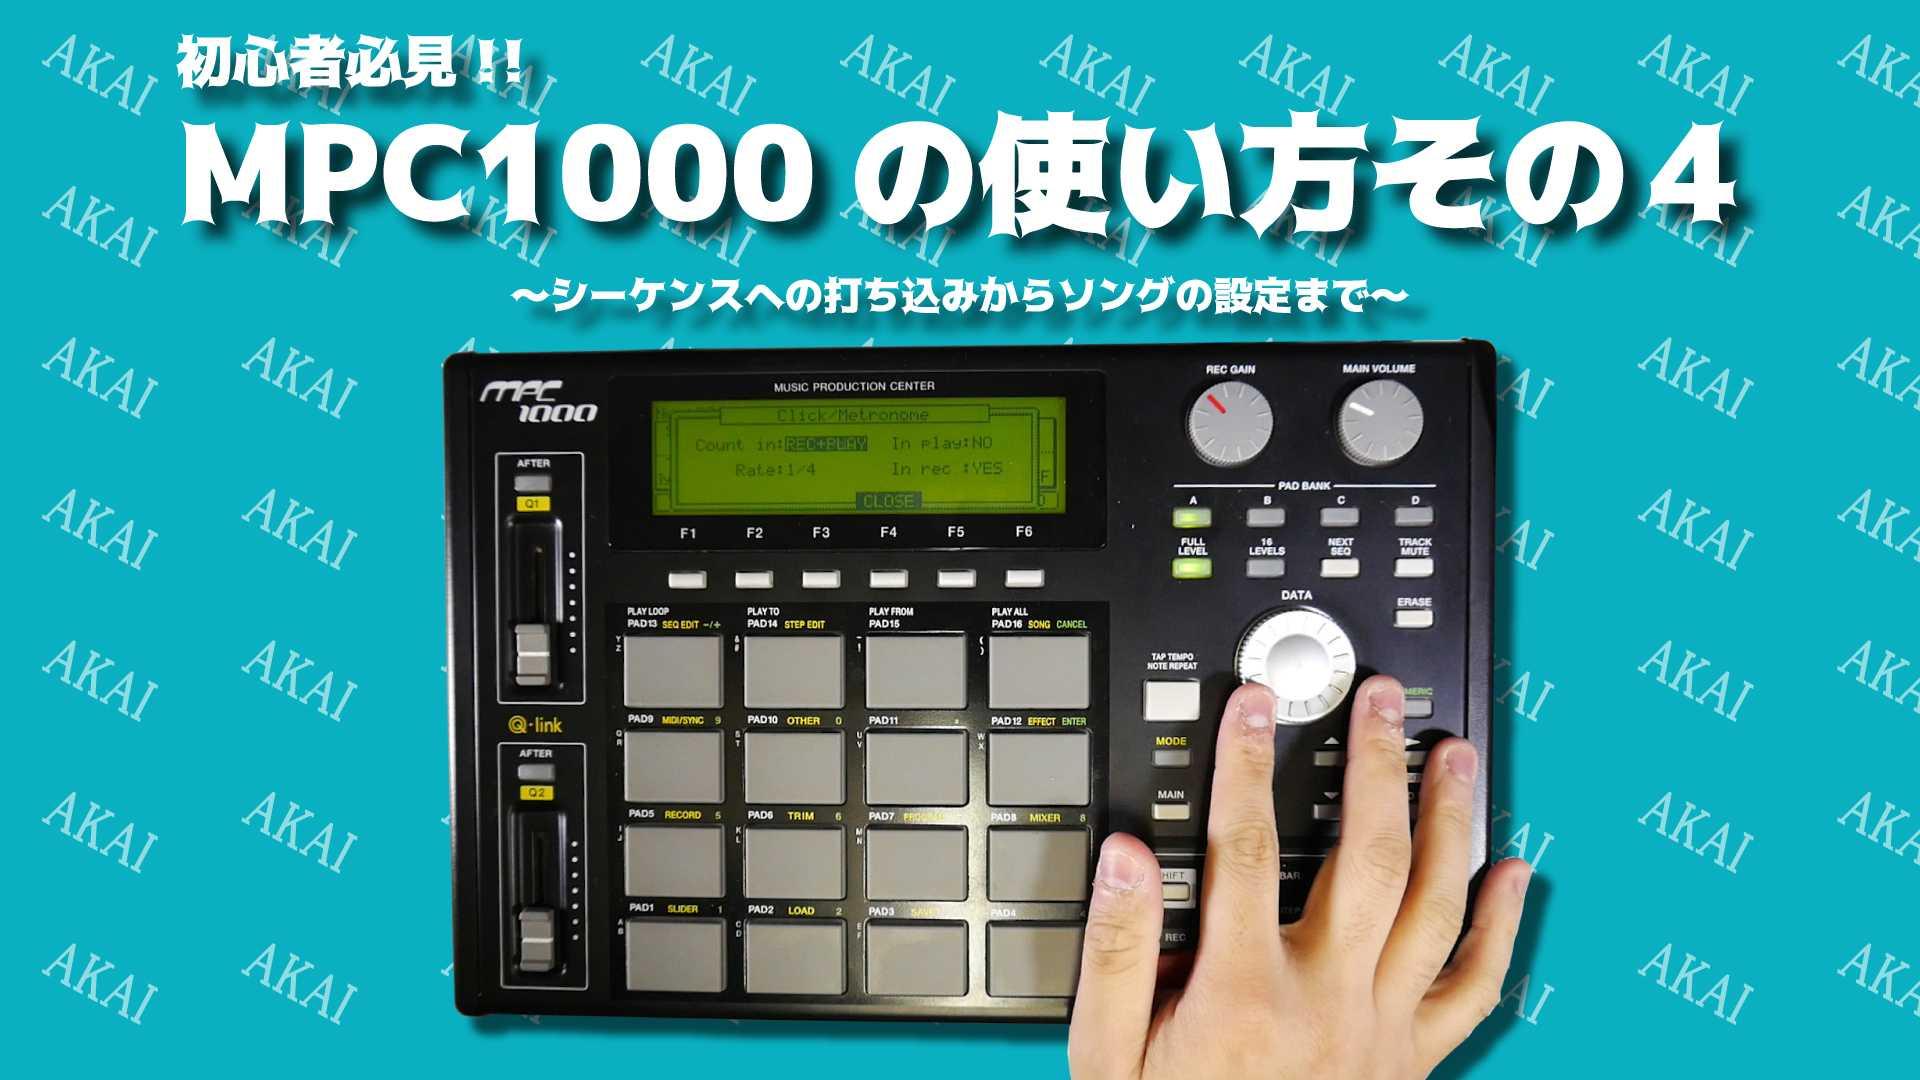 MPC1000の使い方4 シーケンスへの打ち込みからソングの設定まで